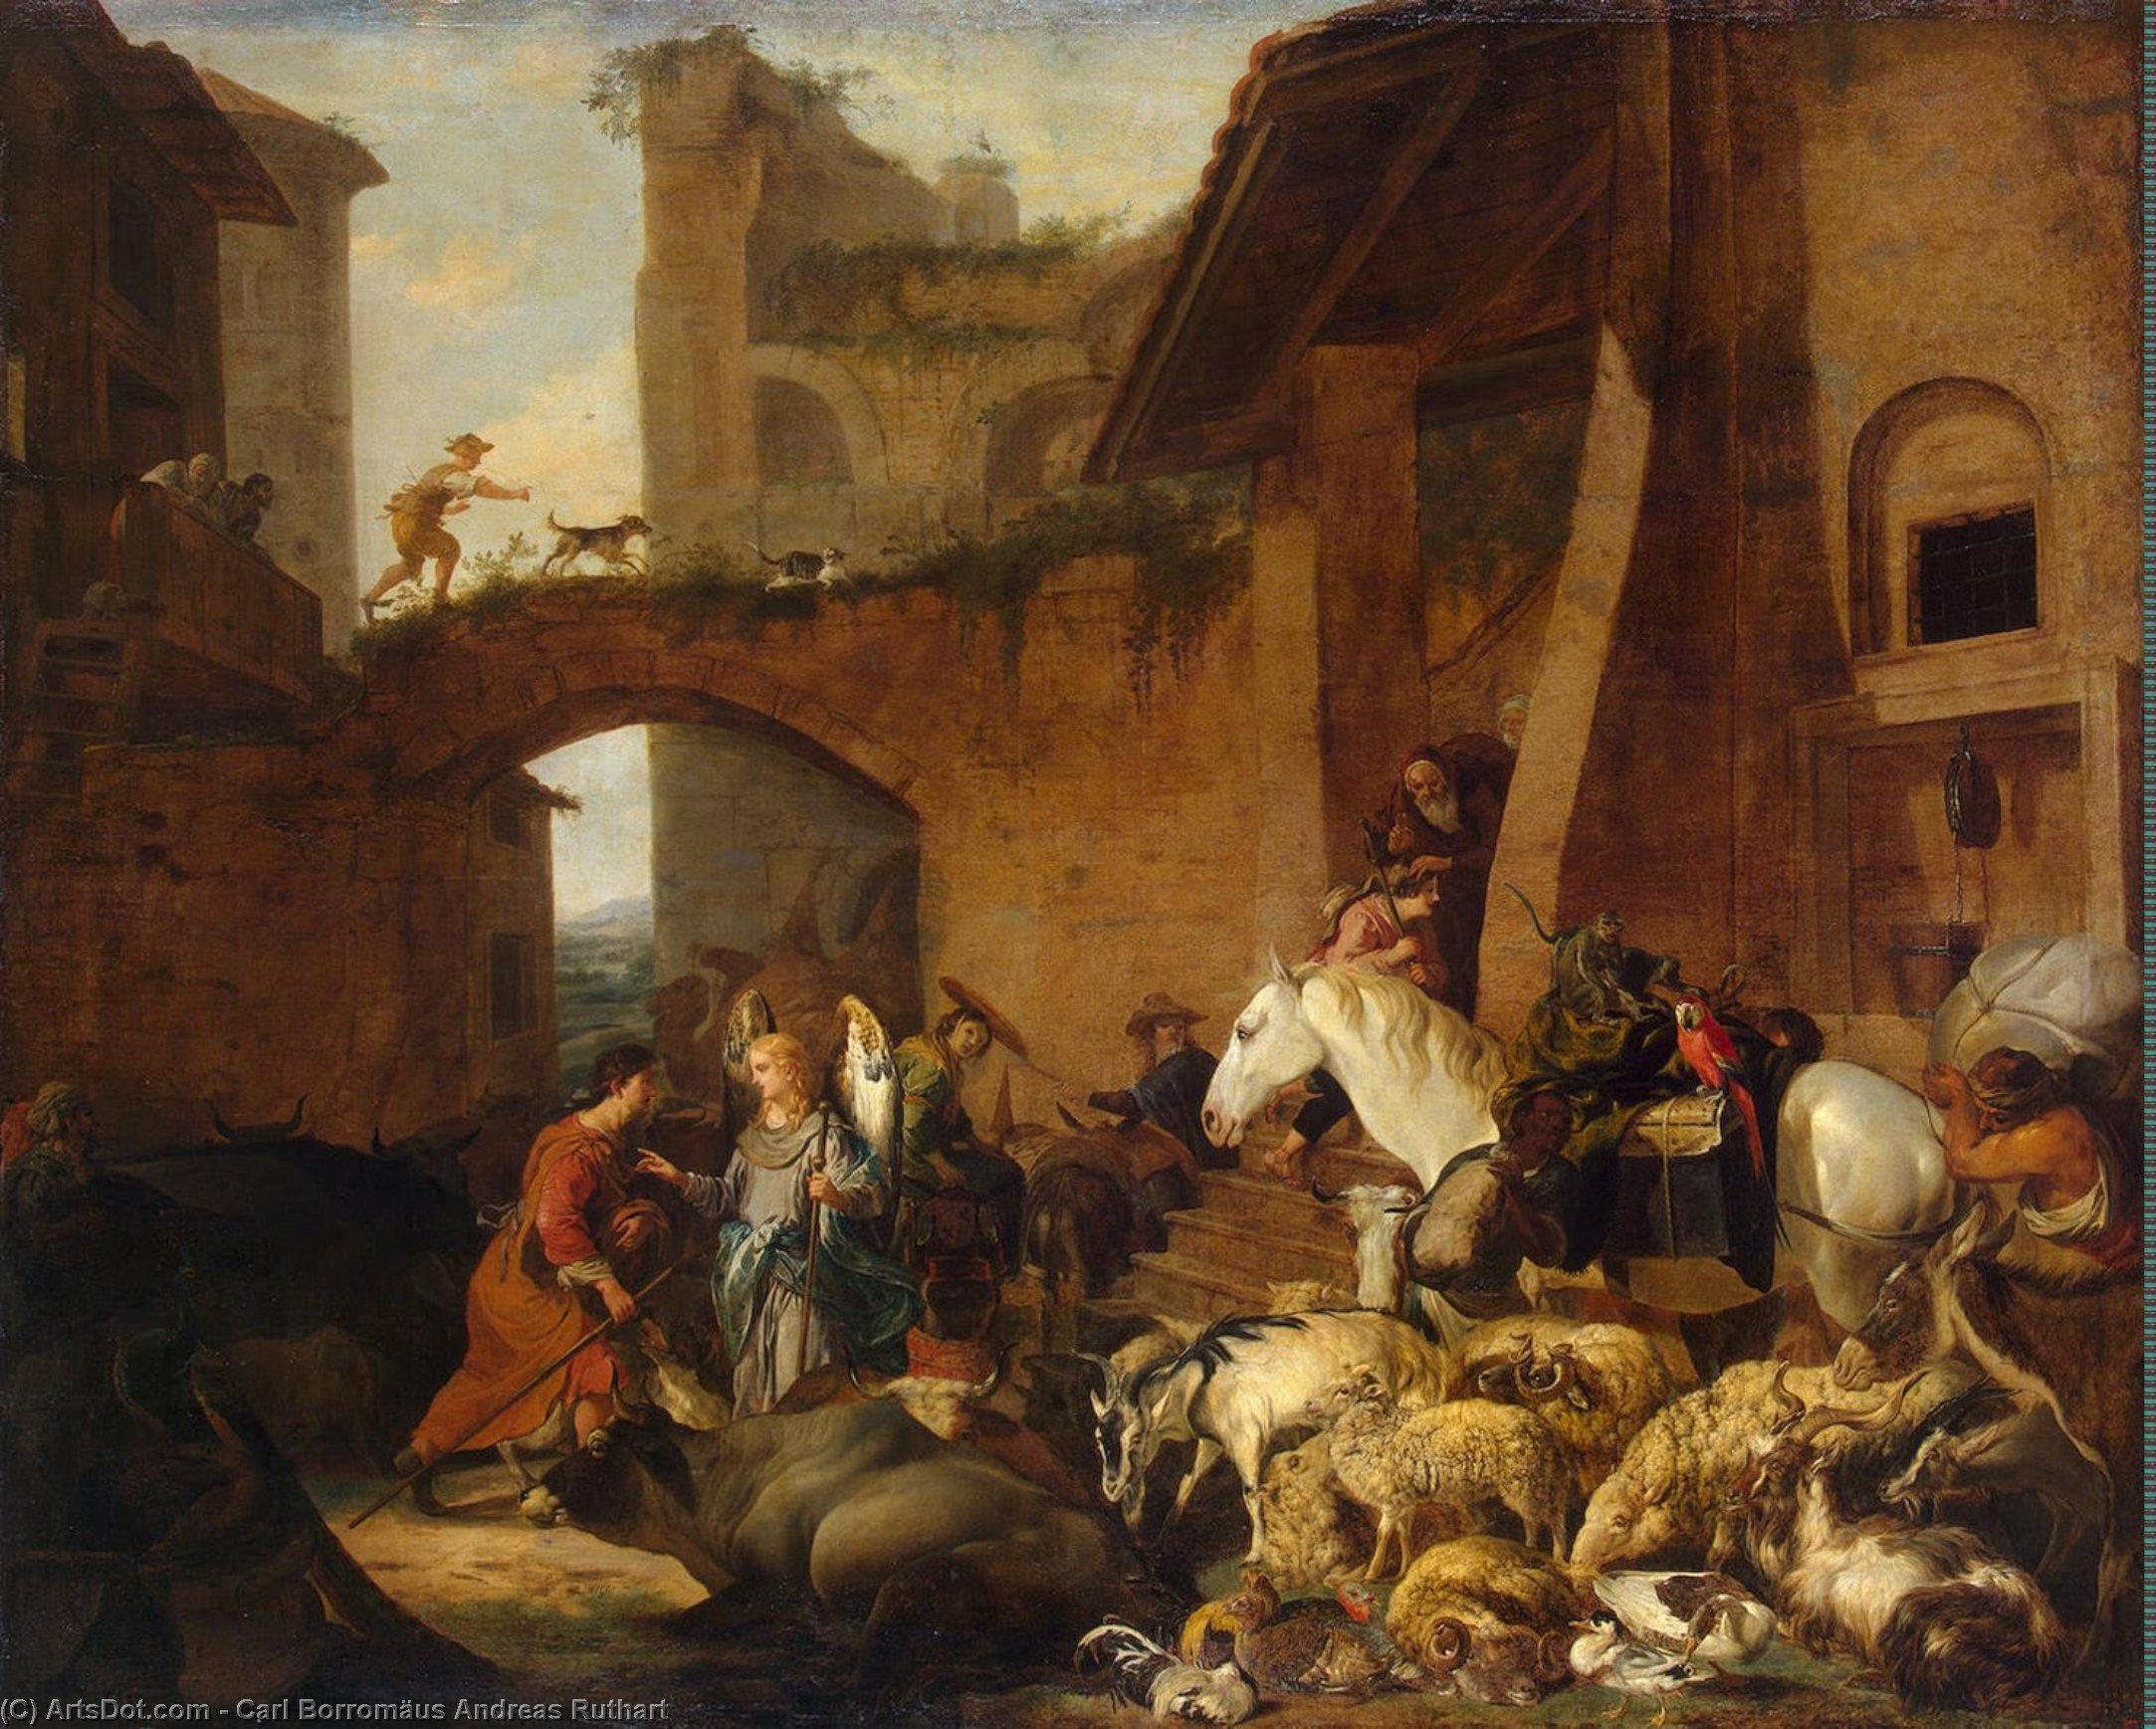 Wikioo.org - The Encyclopedia of Fine Arts - Painting, Artwork by Carl Borromäus Andreas Ruthart - Story of Tobias